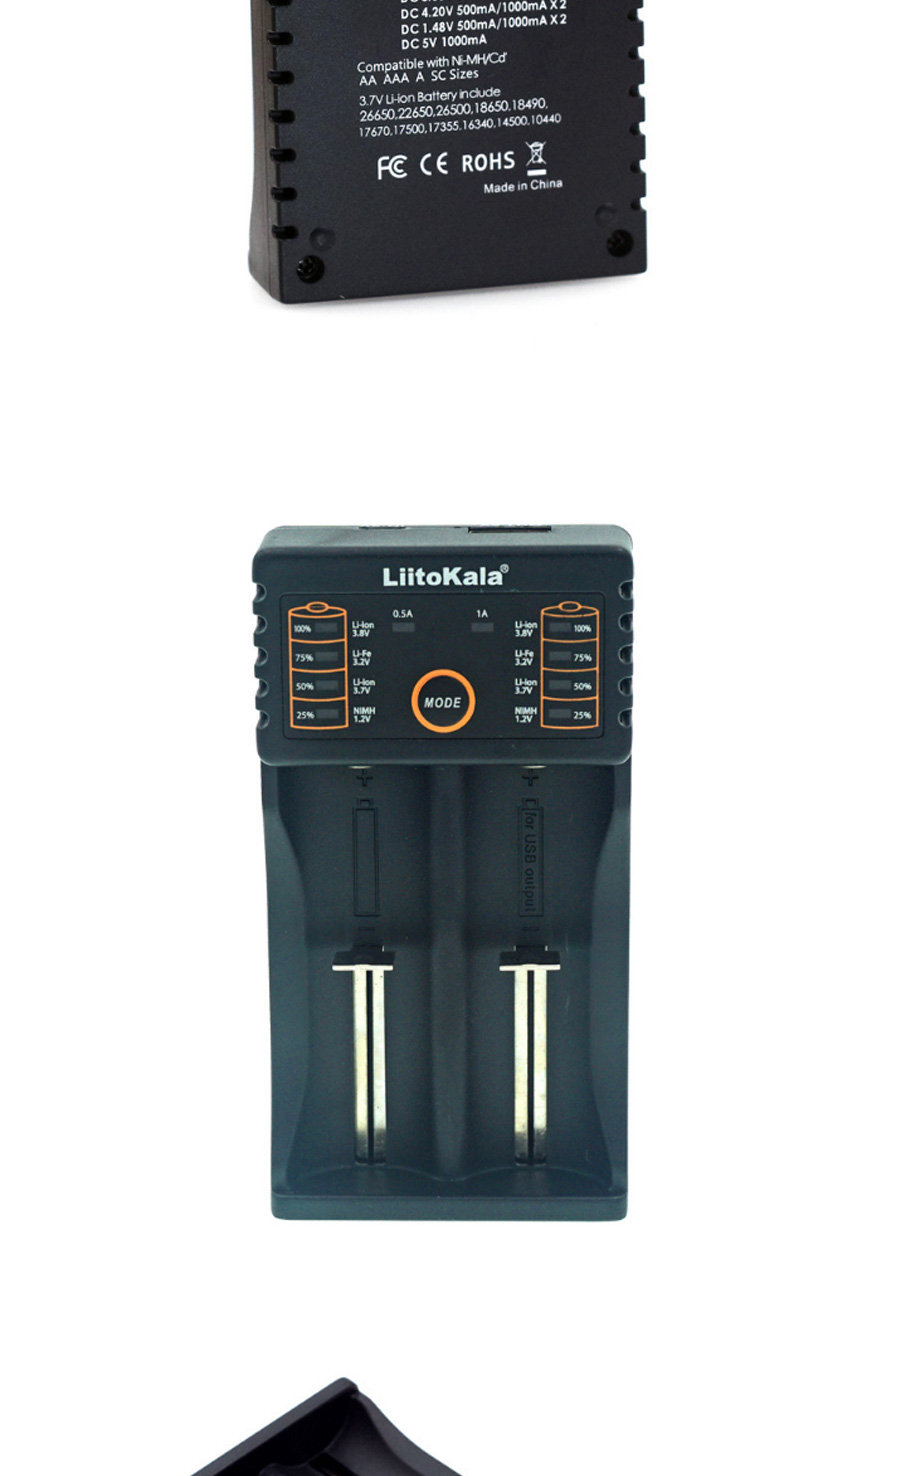 Liitokala Lii 202 Usb Dual Slot Li Ion Ni Mh Cd Battery Charger For Baterai 14500 Batre Recharge Aa A2 37v Stop Output Protection Voltage 3001v Compatible Imr 18650 18490 18350 17670 17500 16340 Rcr123 10440